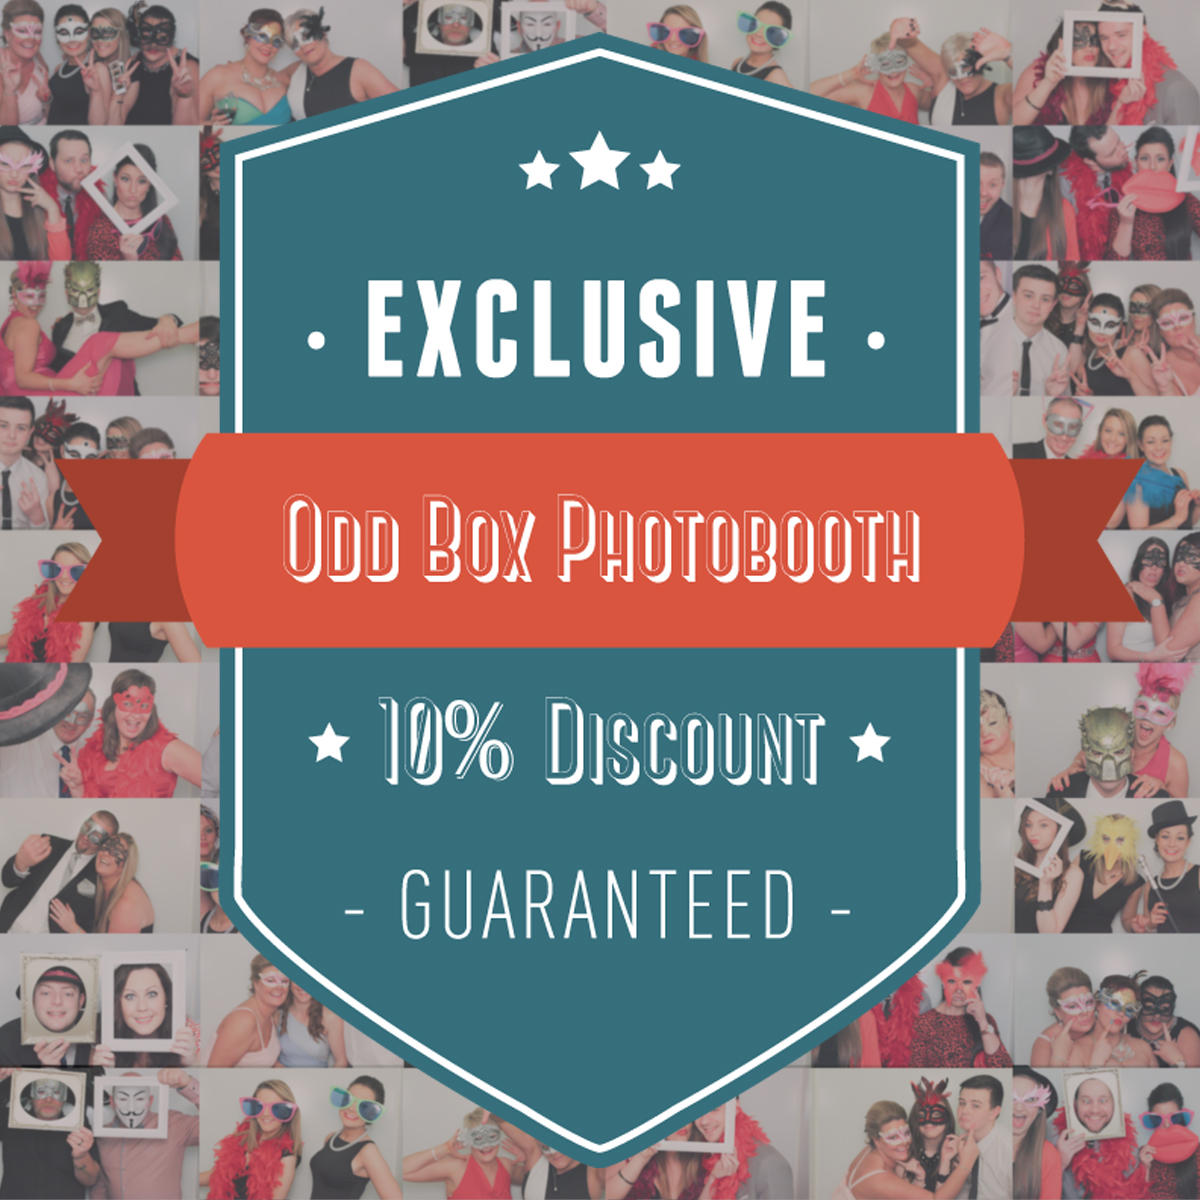 10% discount Photo Booth Scotland Prices Odd Box